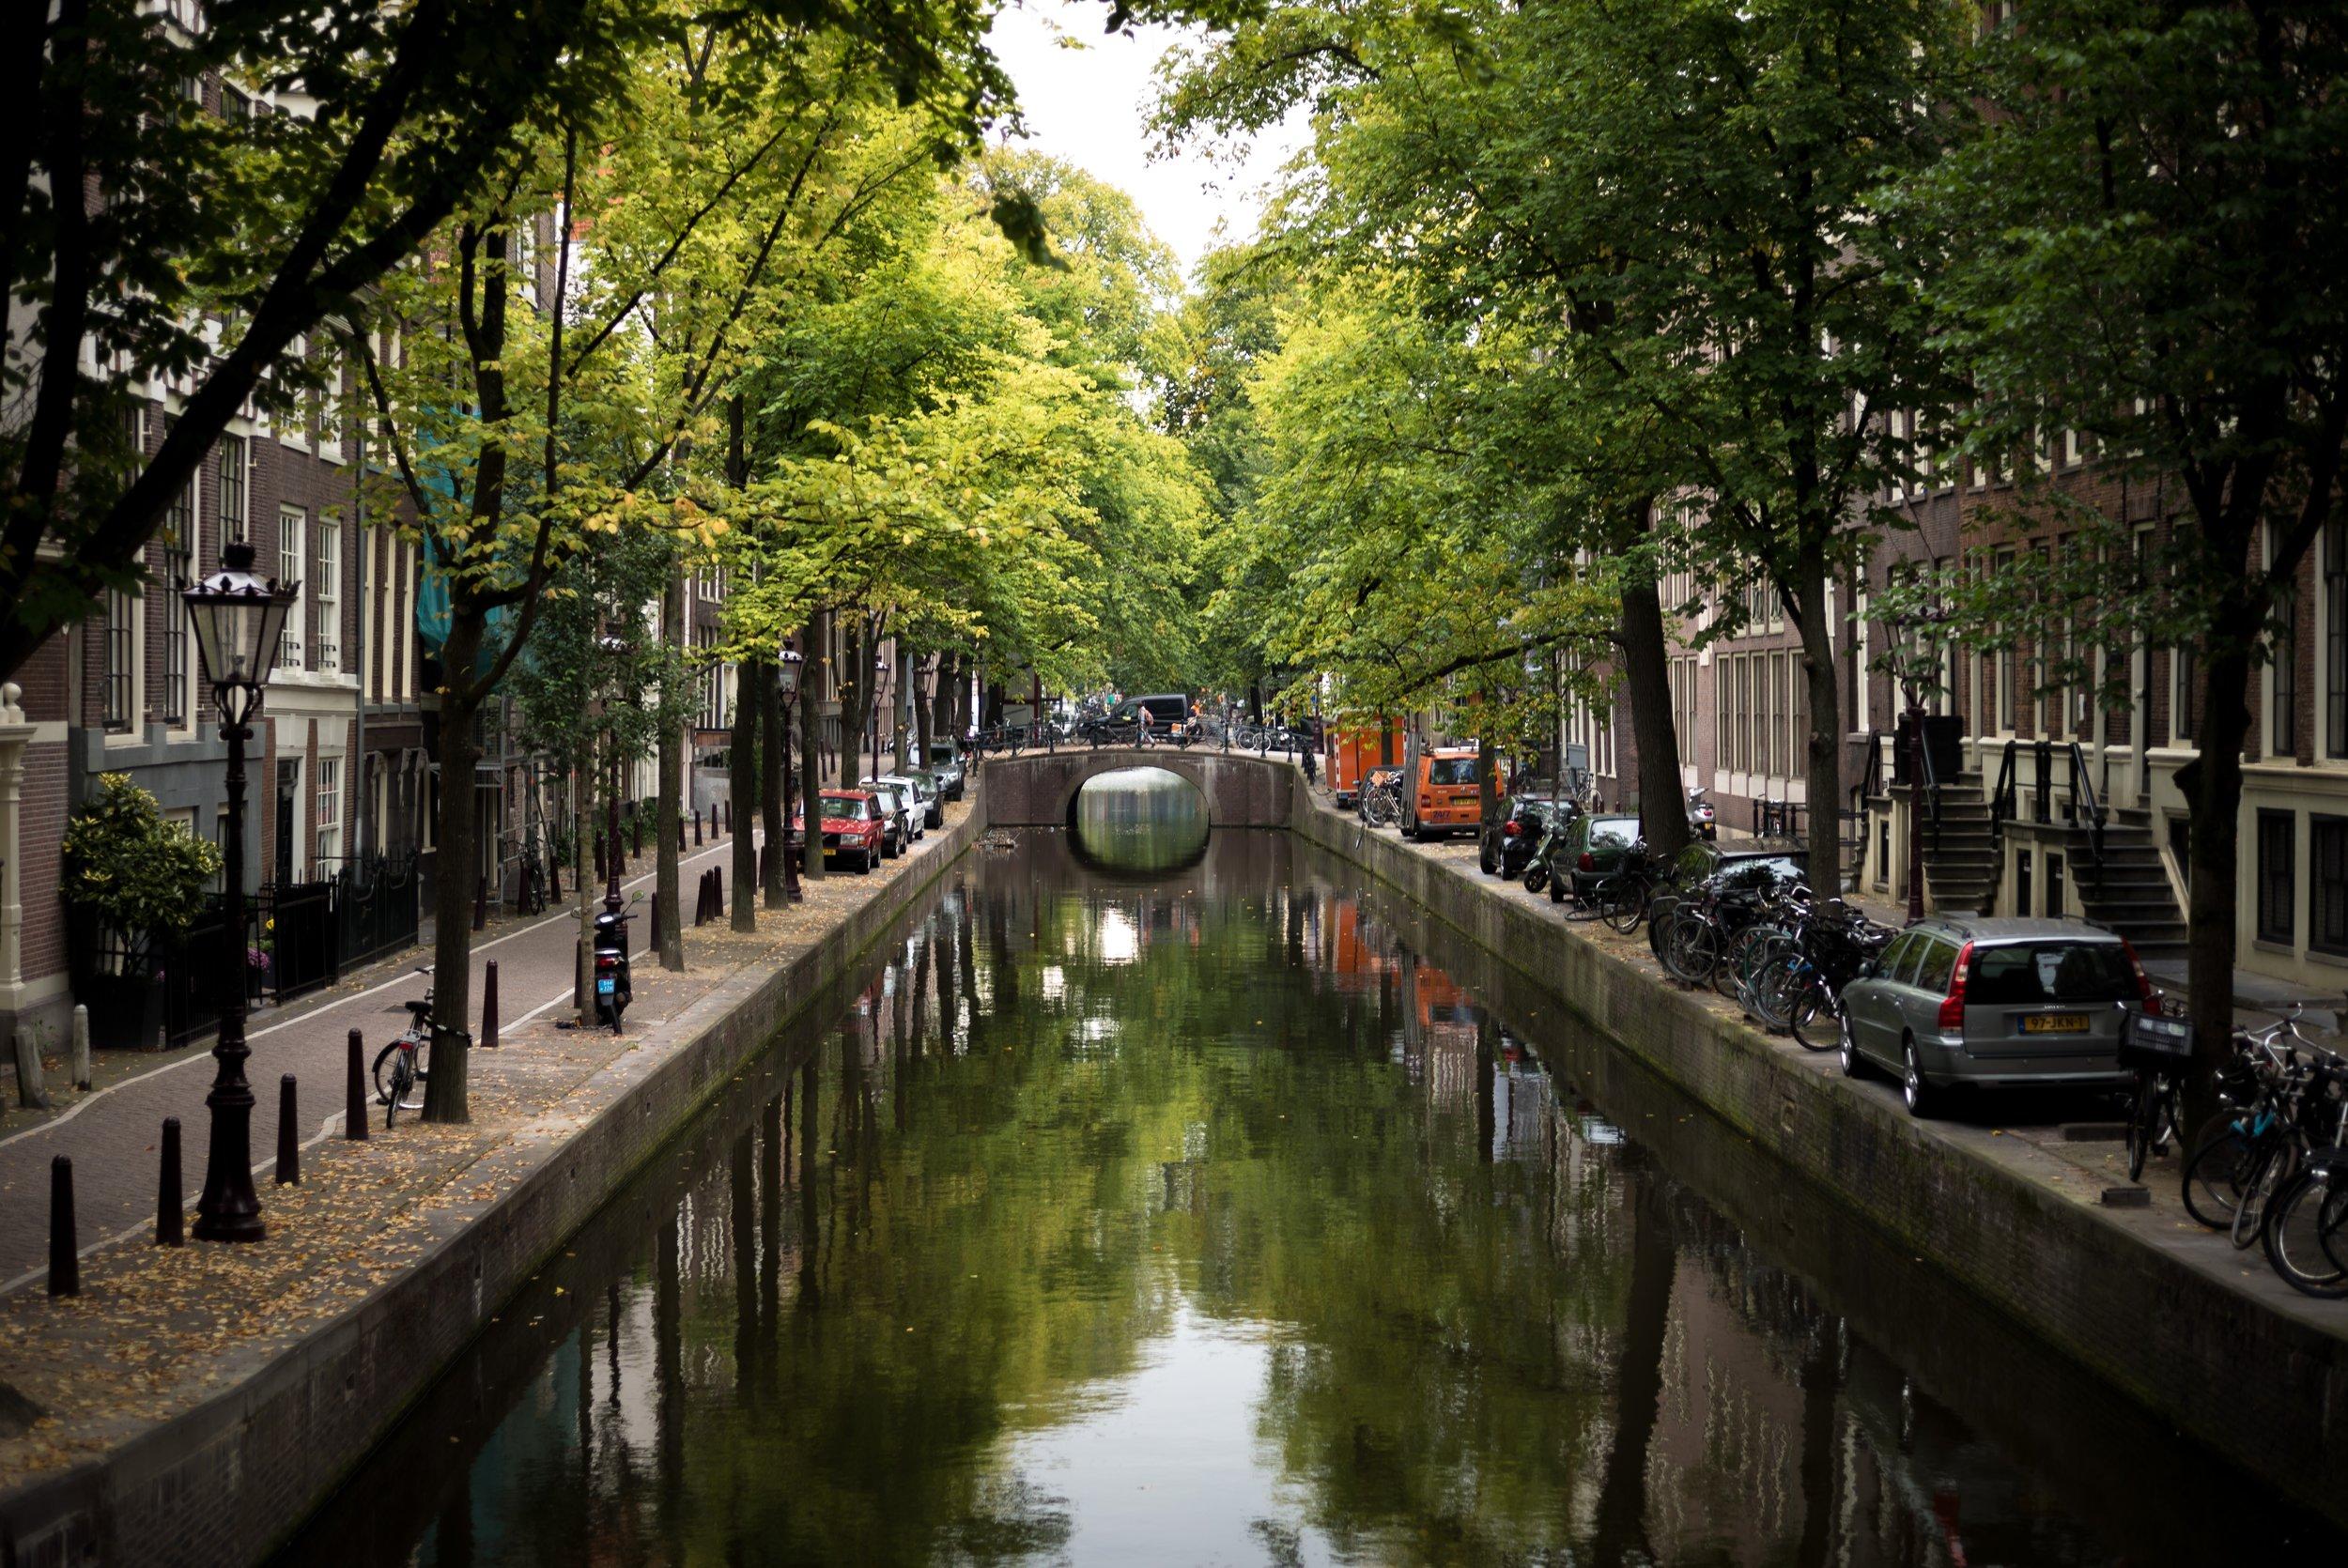 Amsterdam: Photo by  B. Boer on  Unsplash